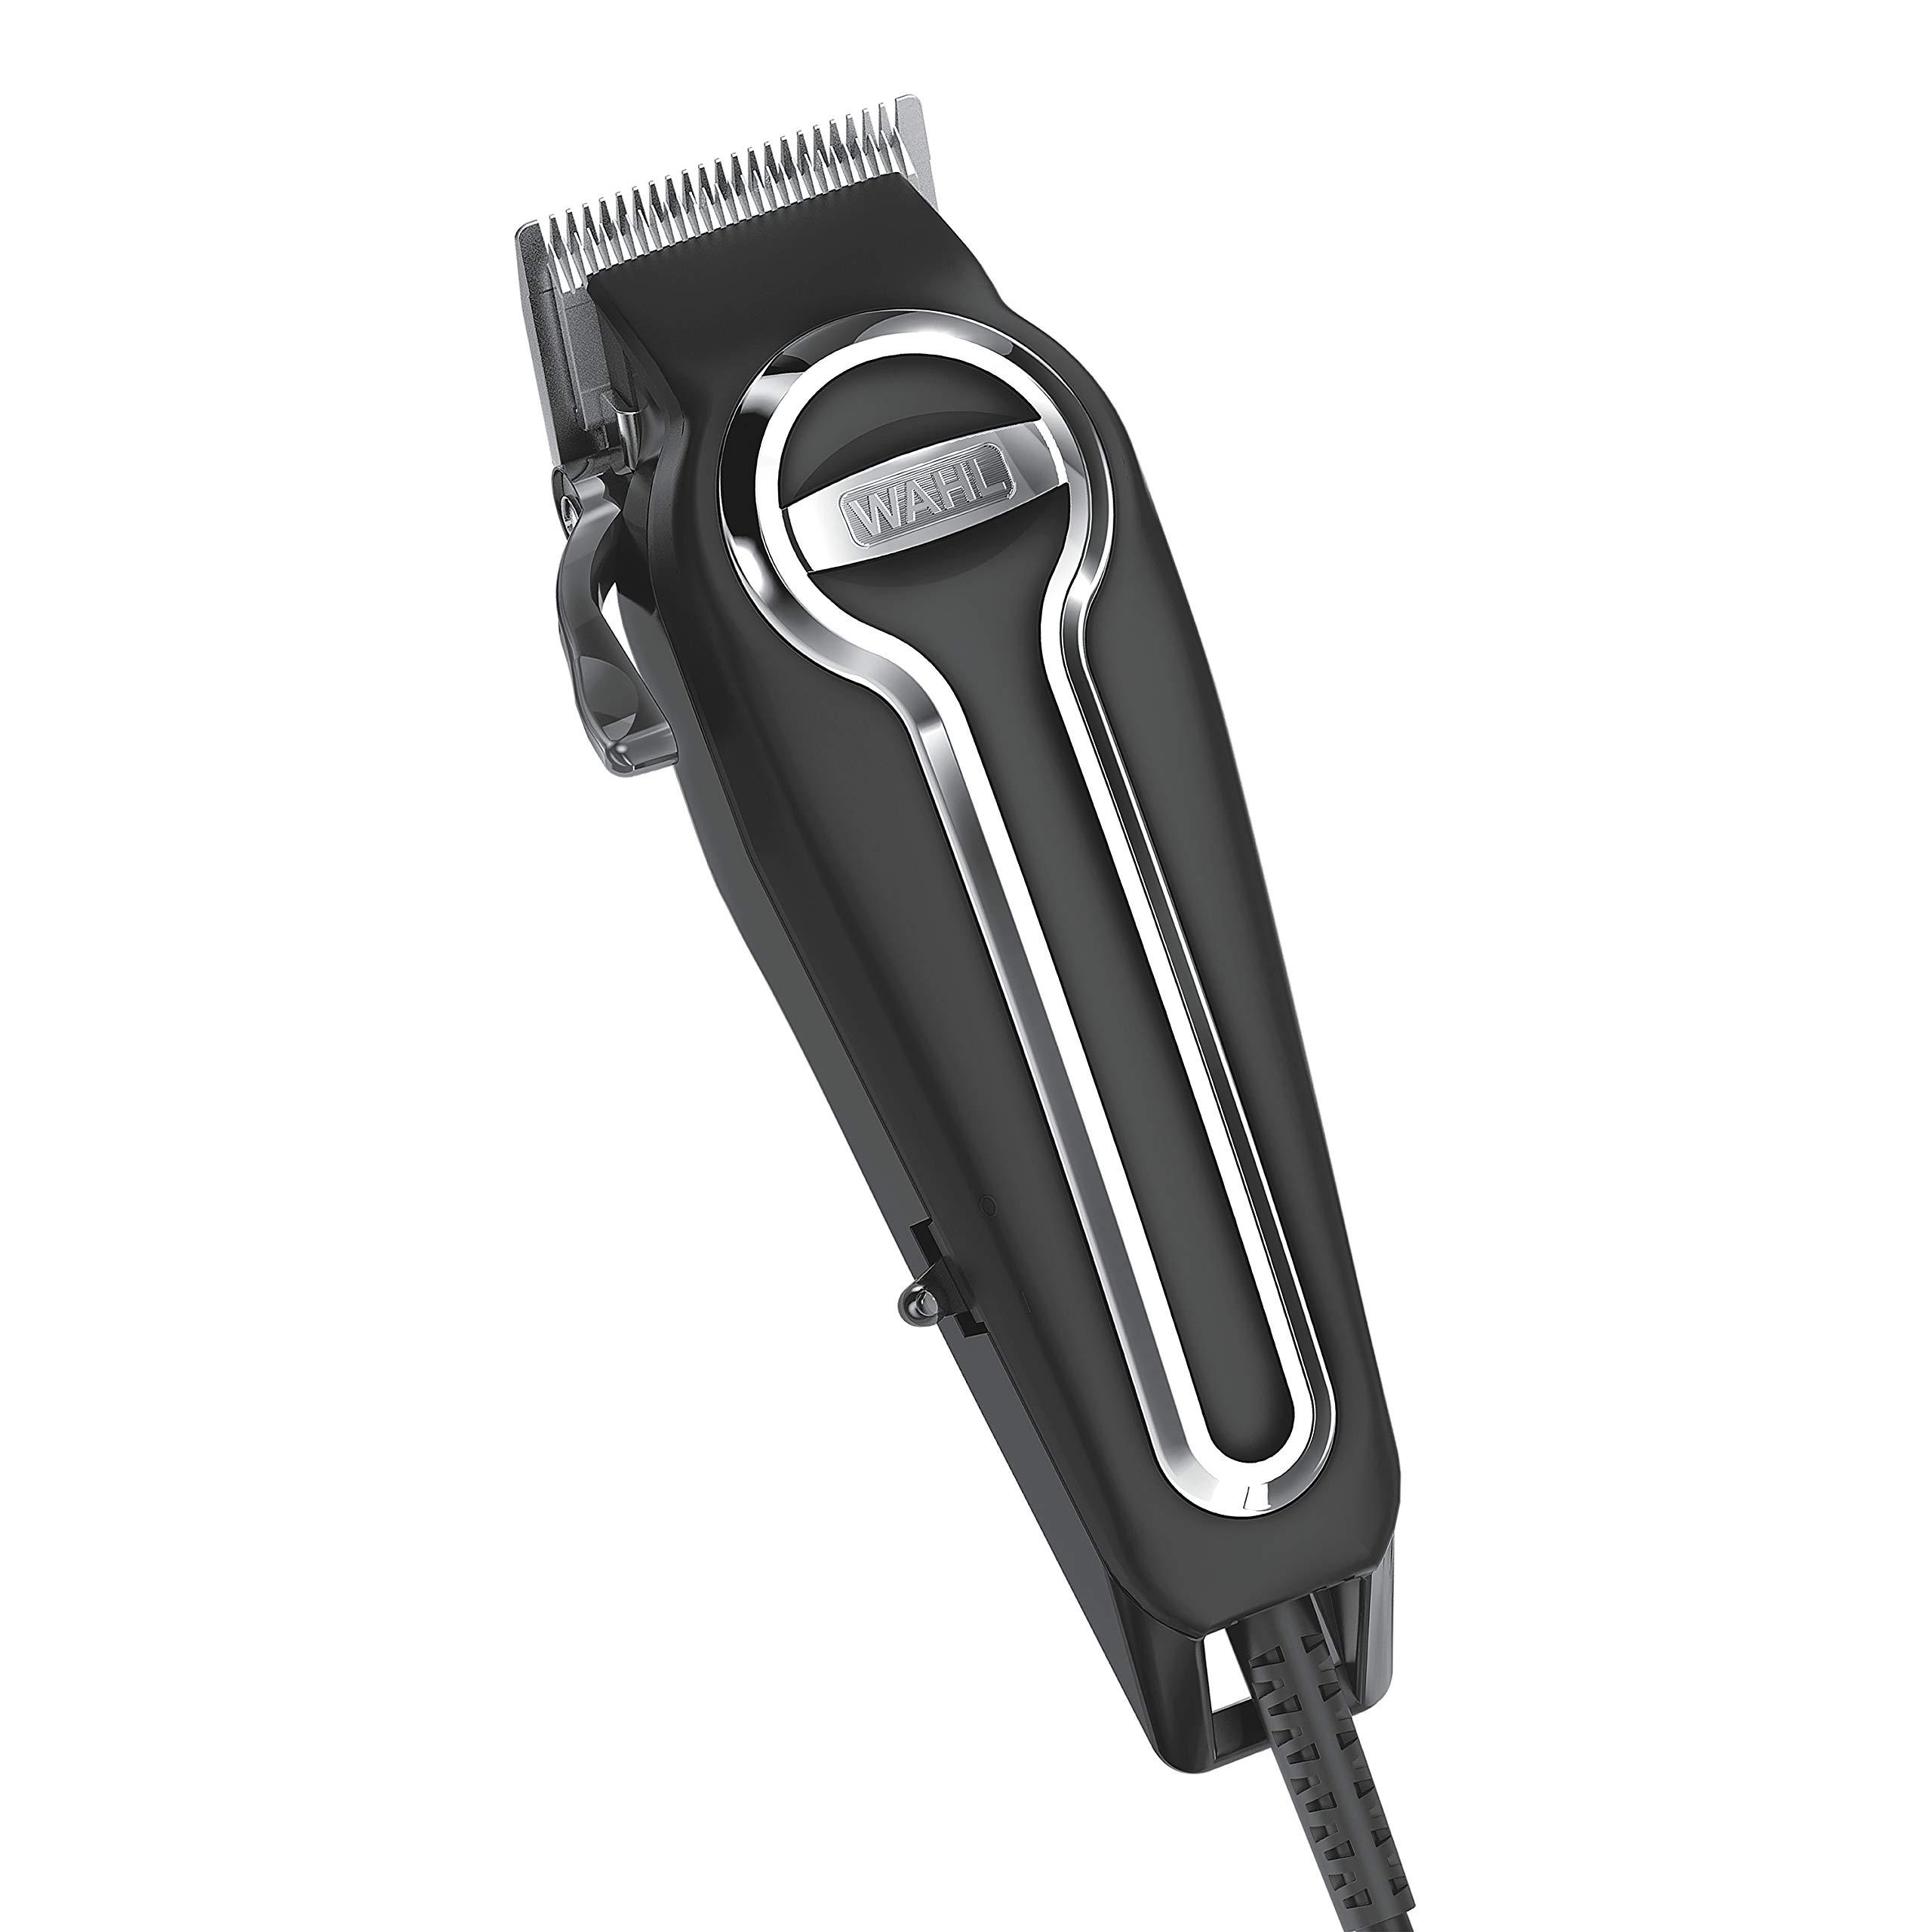 Clipper Elite High Performance Haircut Grooming